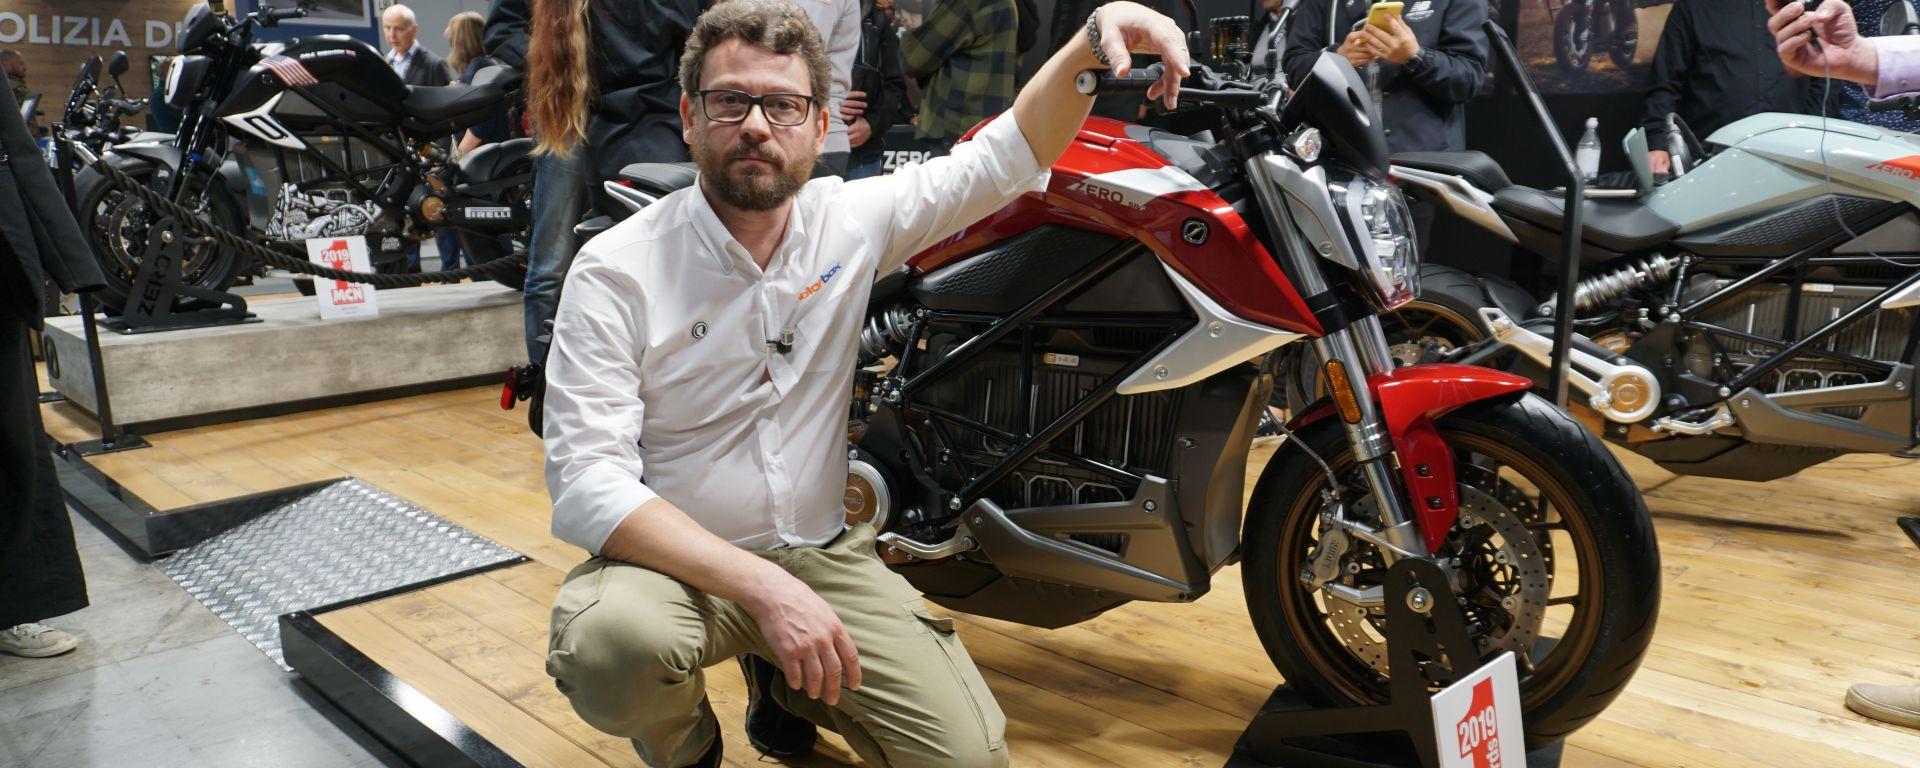 Zero Motorcycles, Zero SR/F, La naked elettrica presentata a Eicma 2019